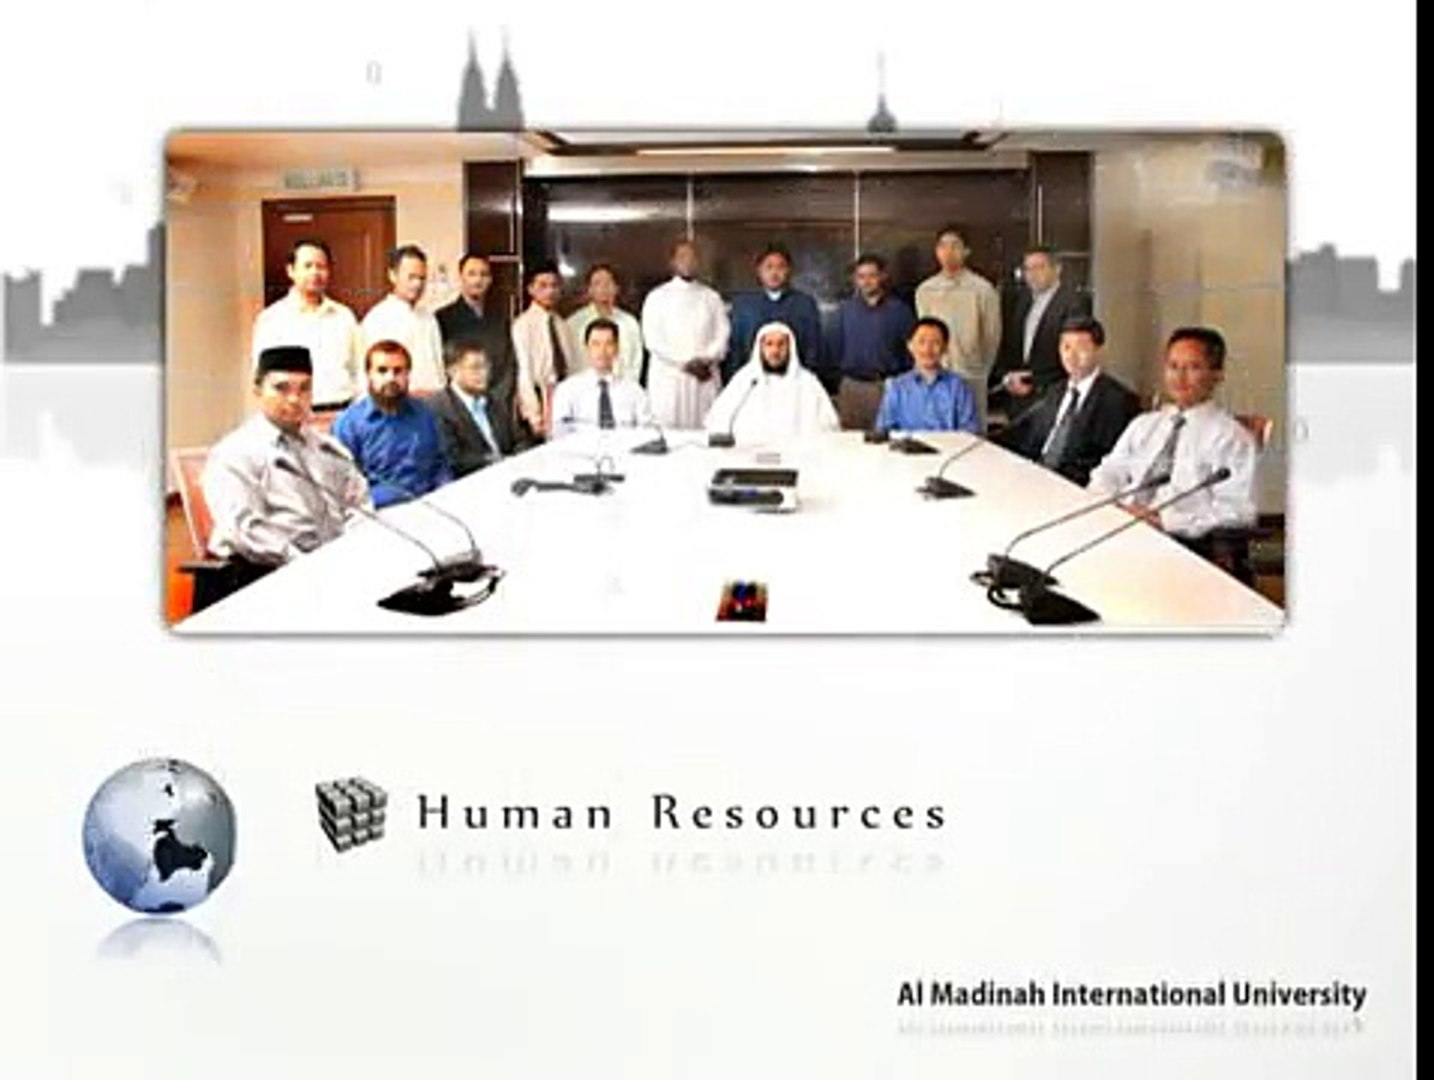 Al Madinah International University Mediu Presentation Video Dailymotion